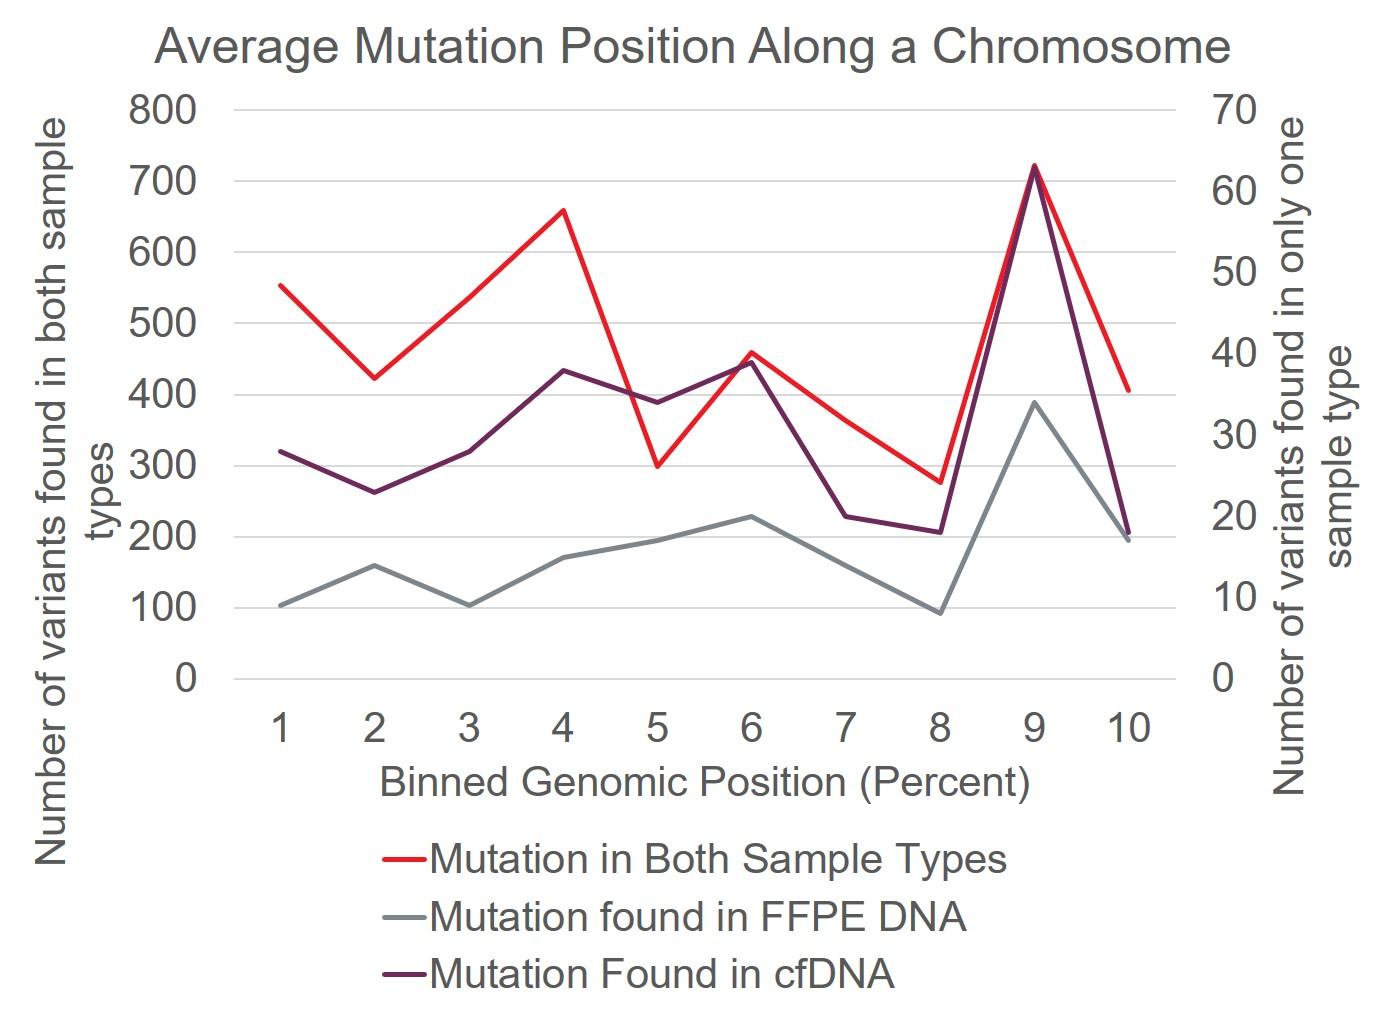 Average Mutation Position Along a Chromosome